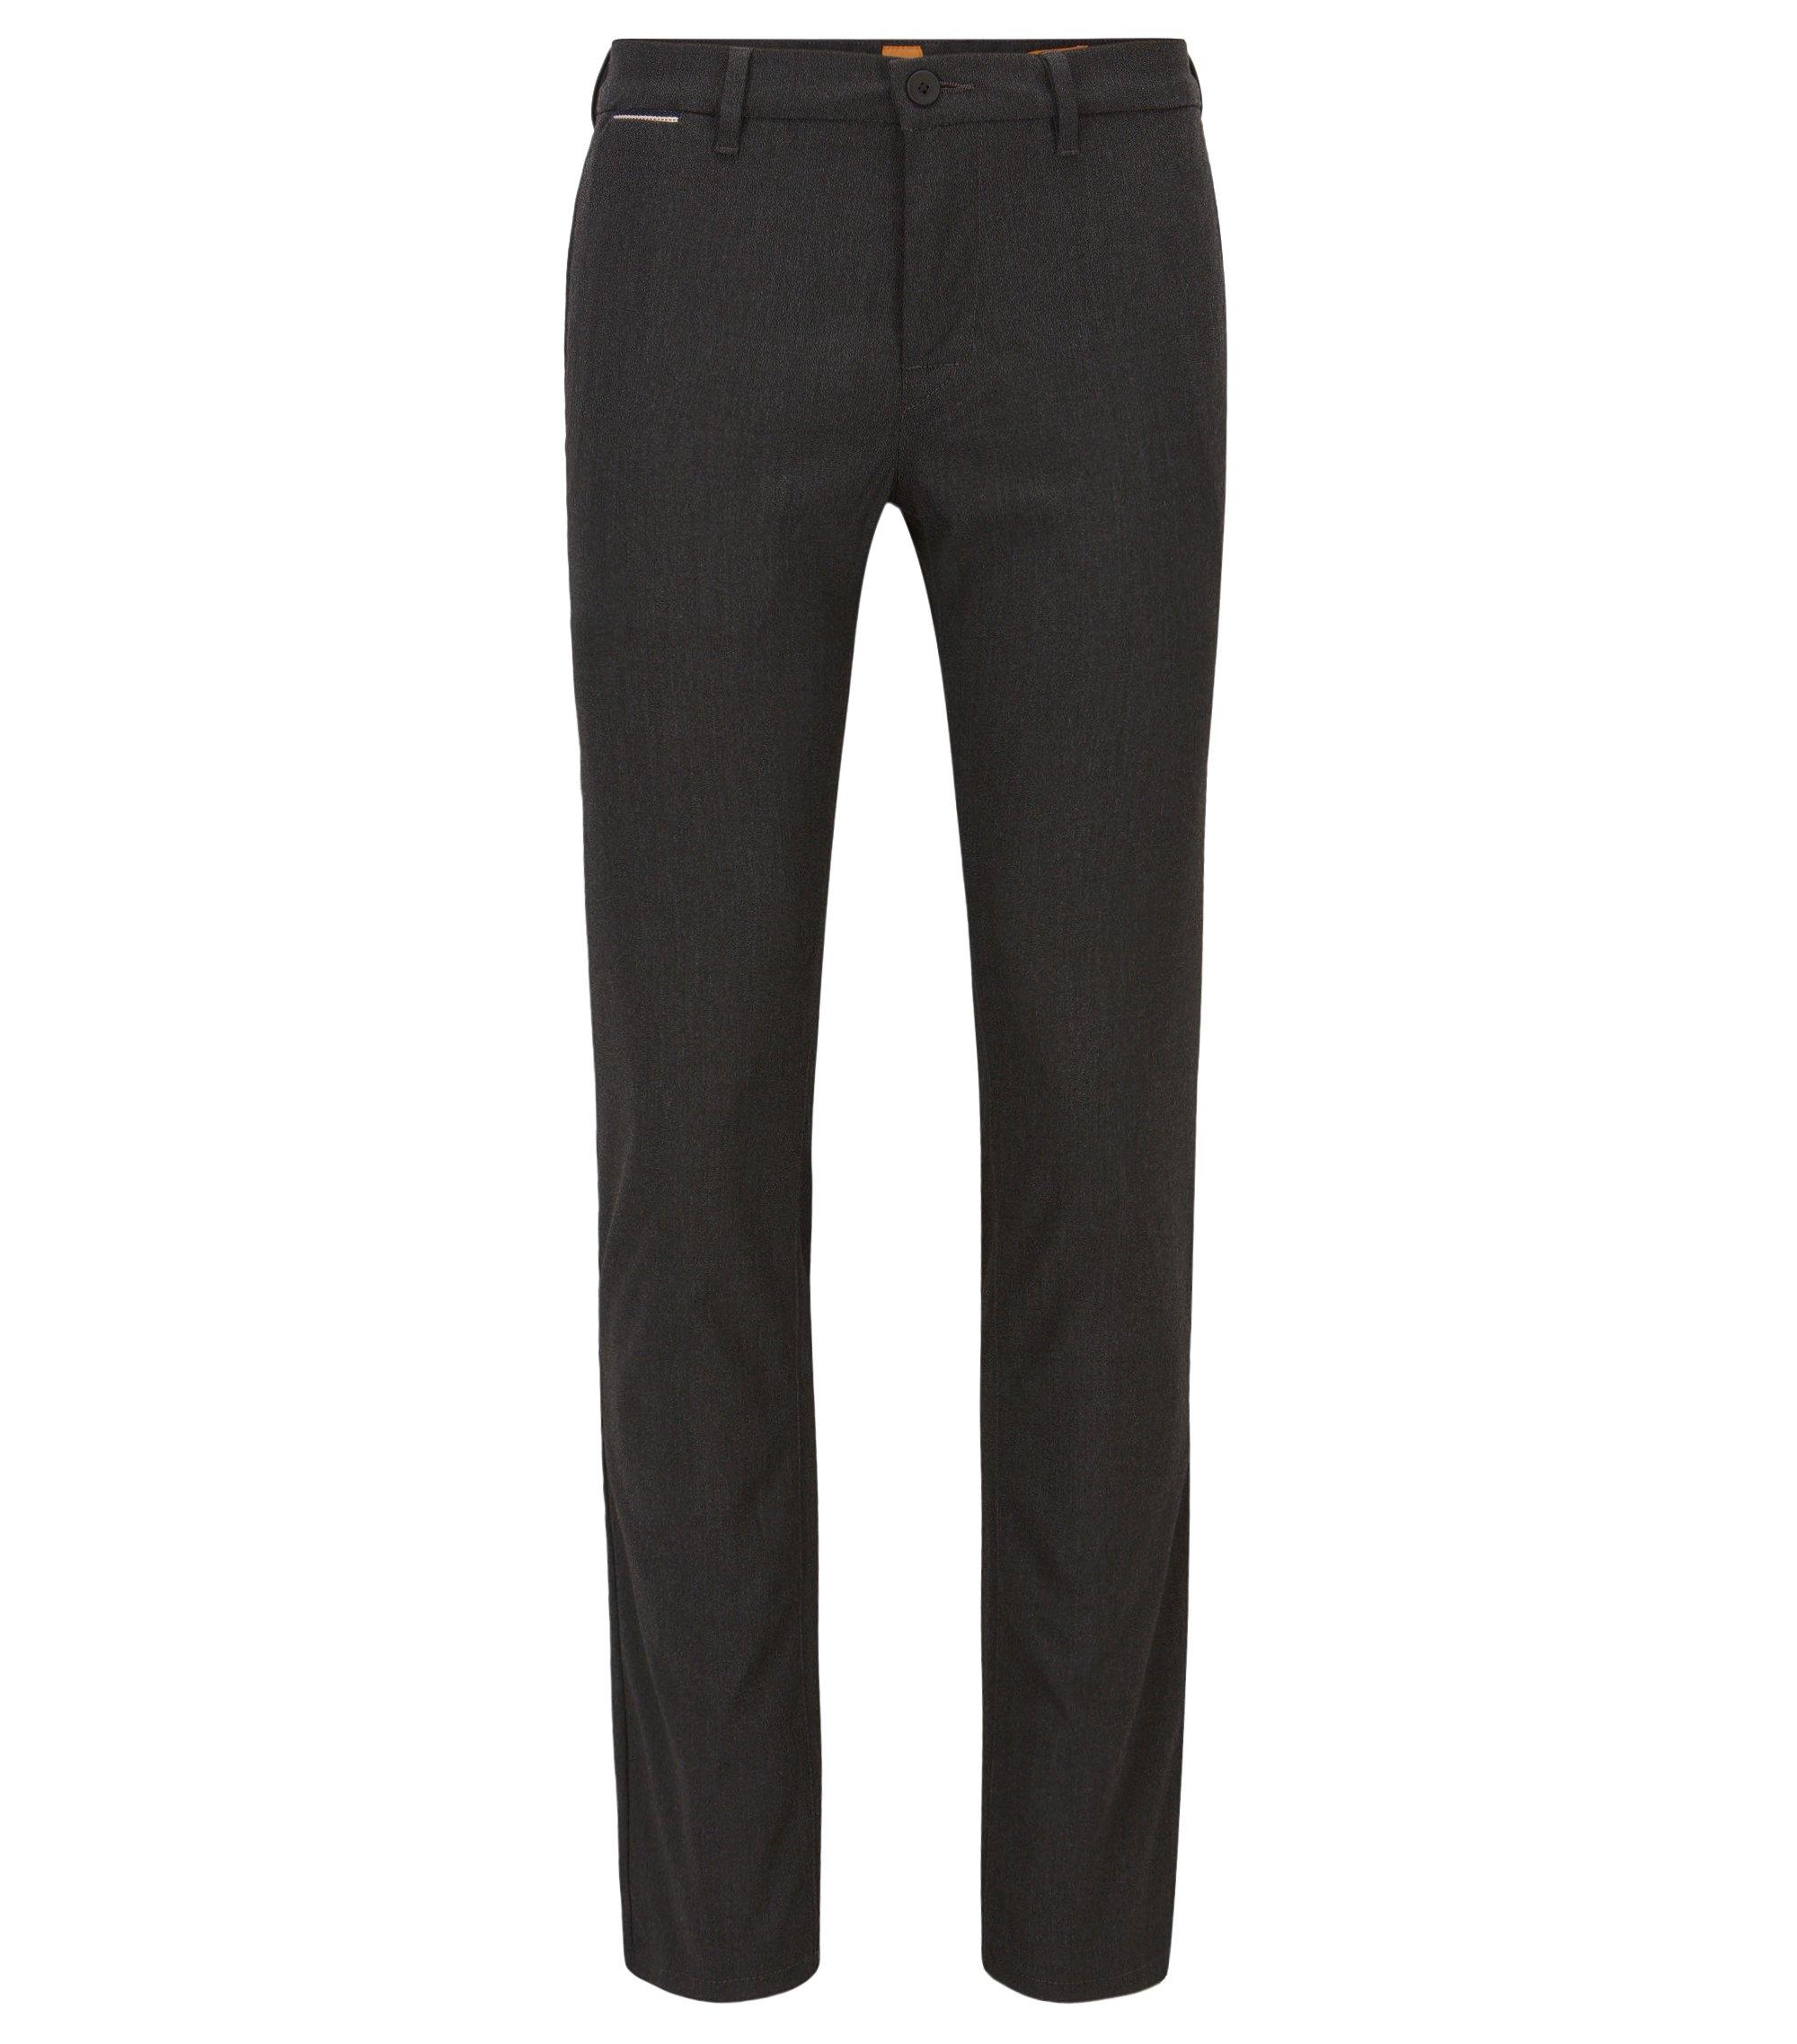 Stretch Chino Pants | Schino Slim, Black